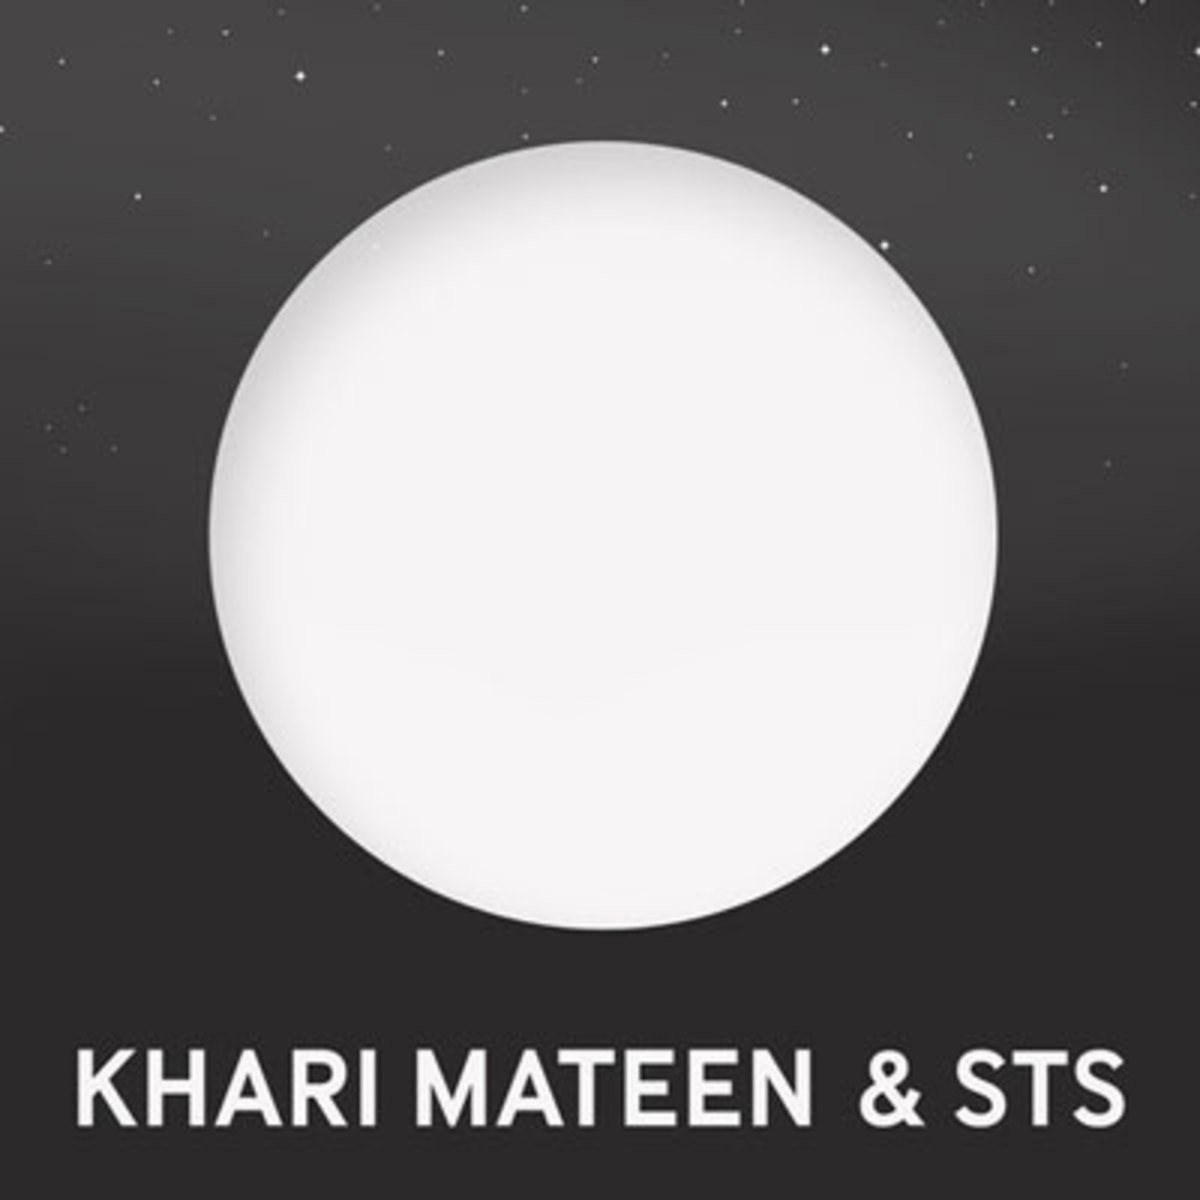 kharimateen-fullmoon.jpg